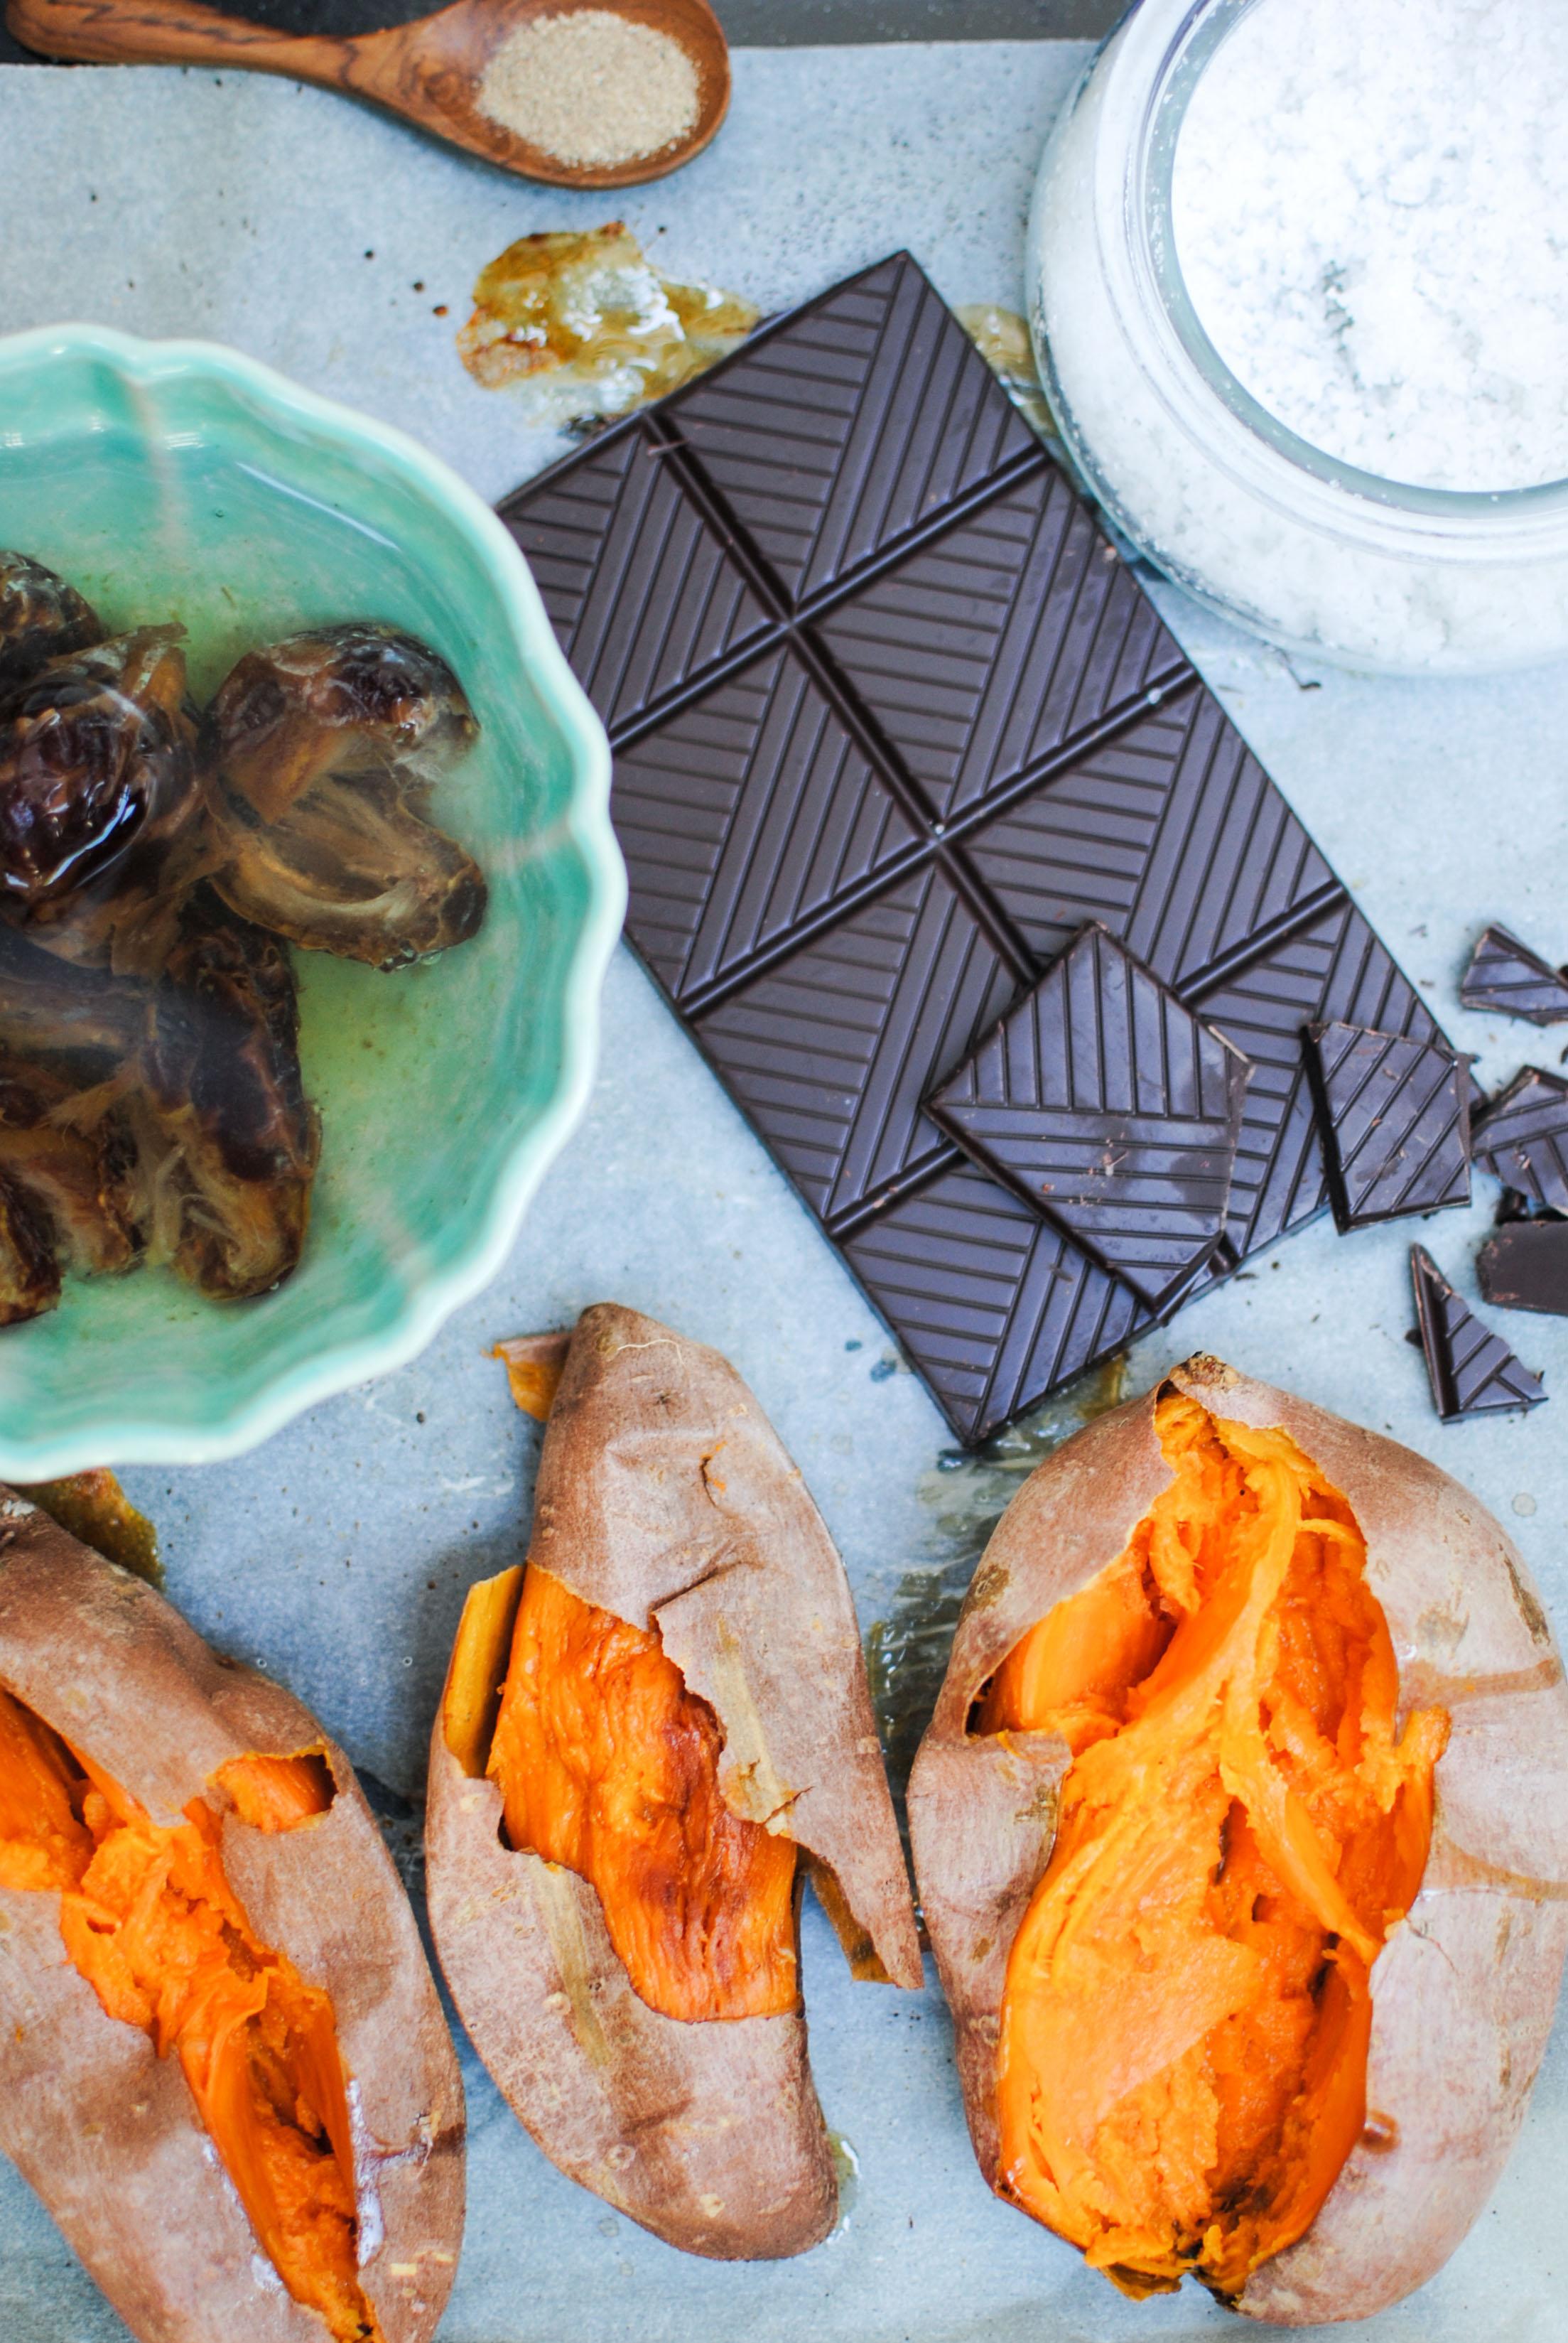 chocolate chip chai icecream | please consider | joana limao